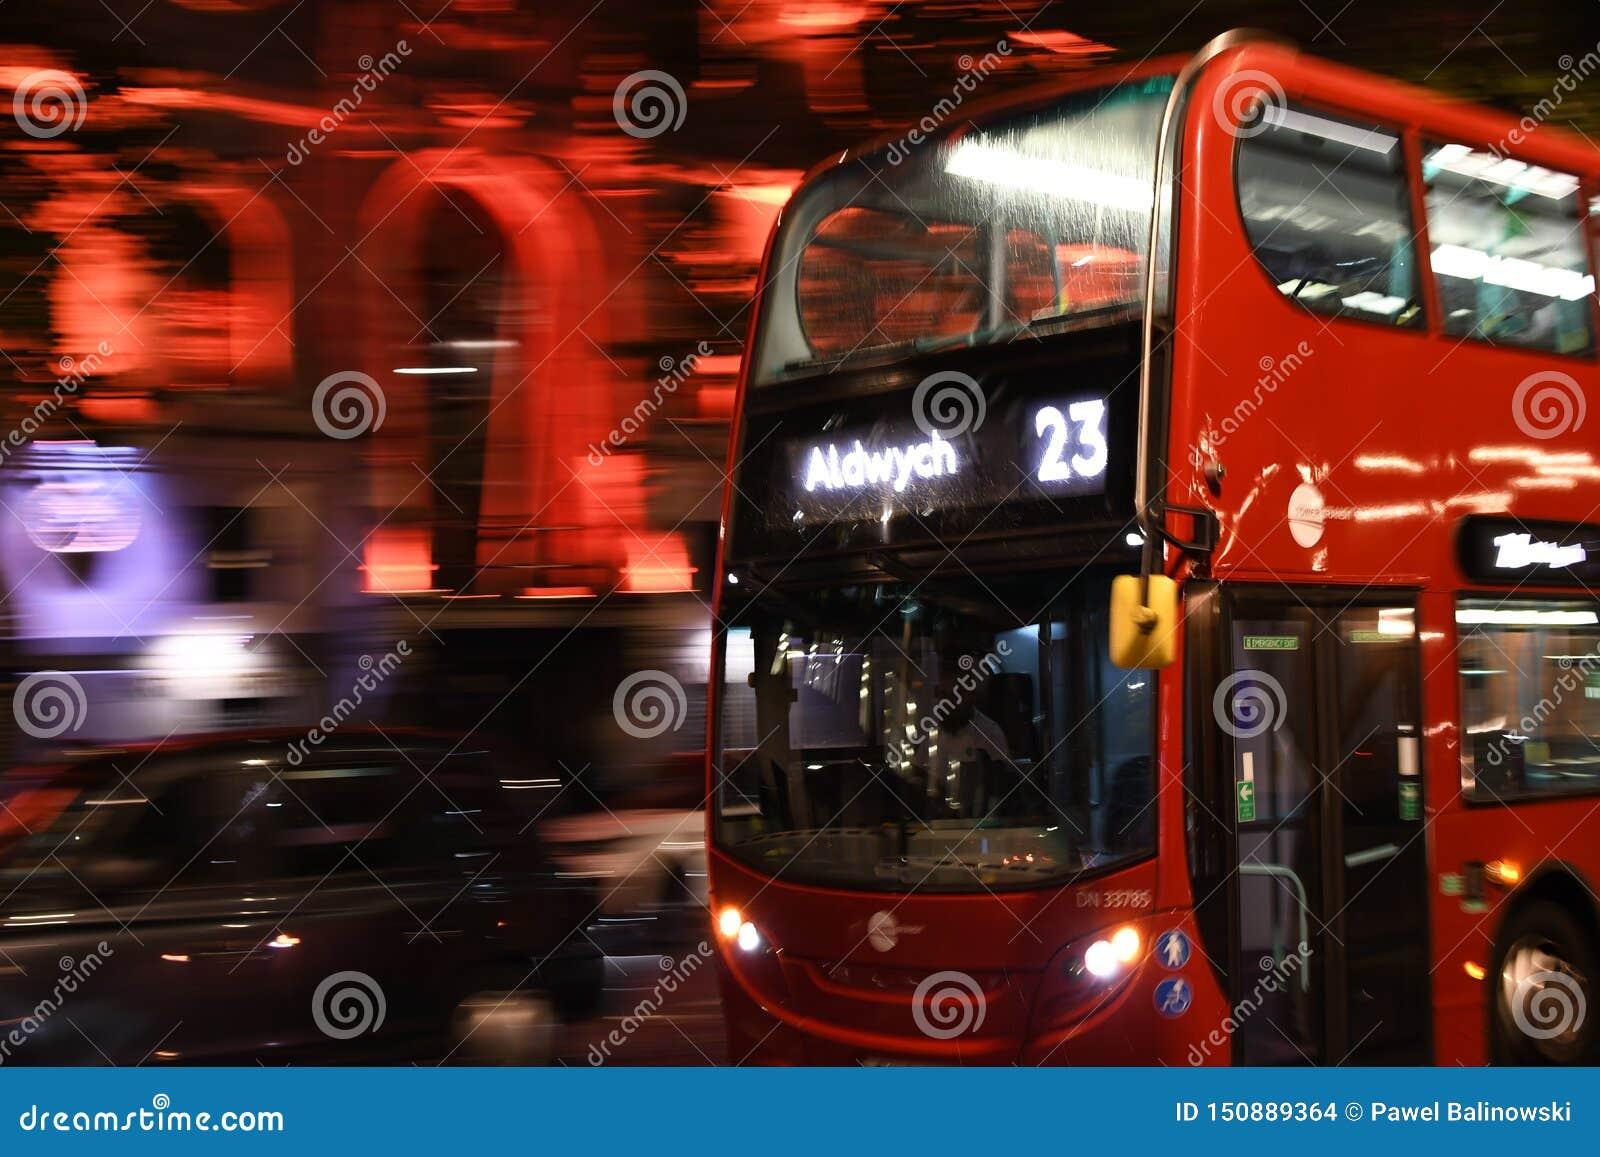 Bus on the London street